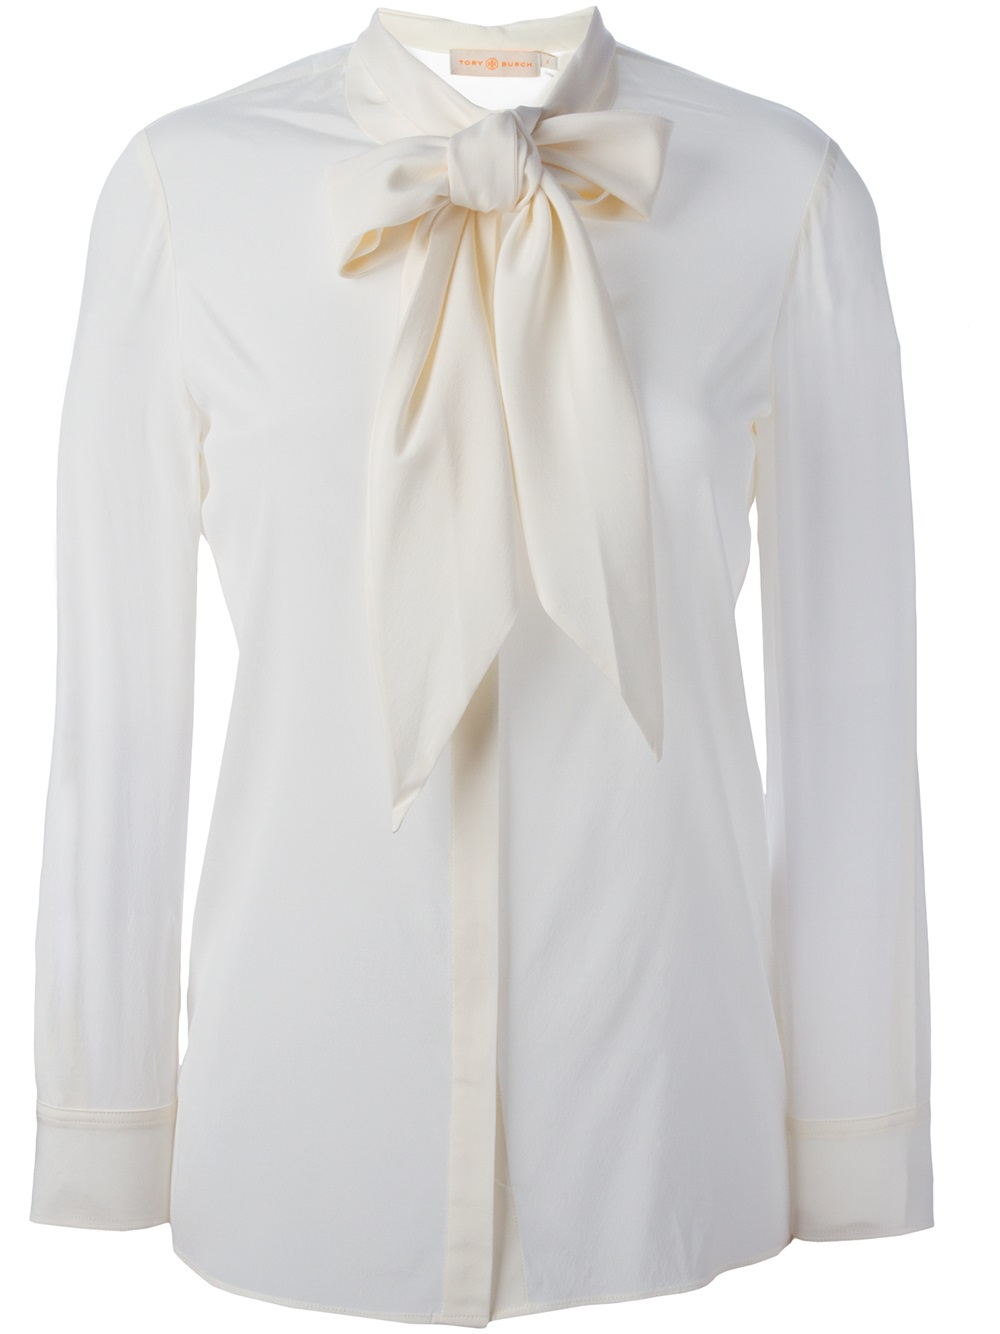 d49951f359d52 Lyst - Tory Burch Silk Tie Blouse in White